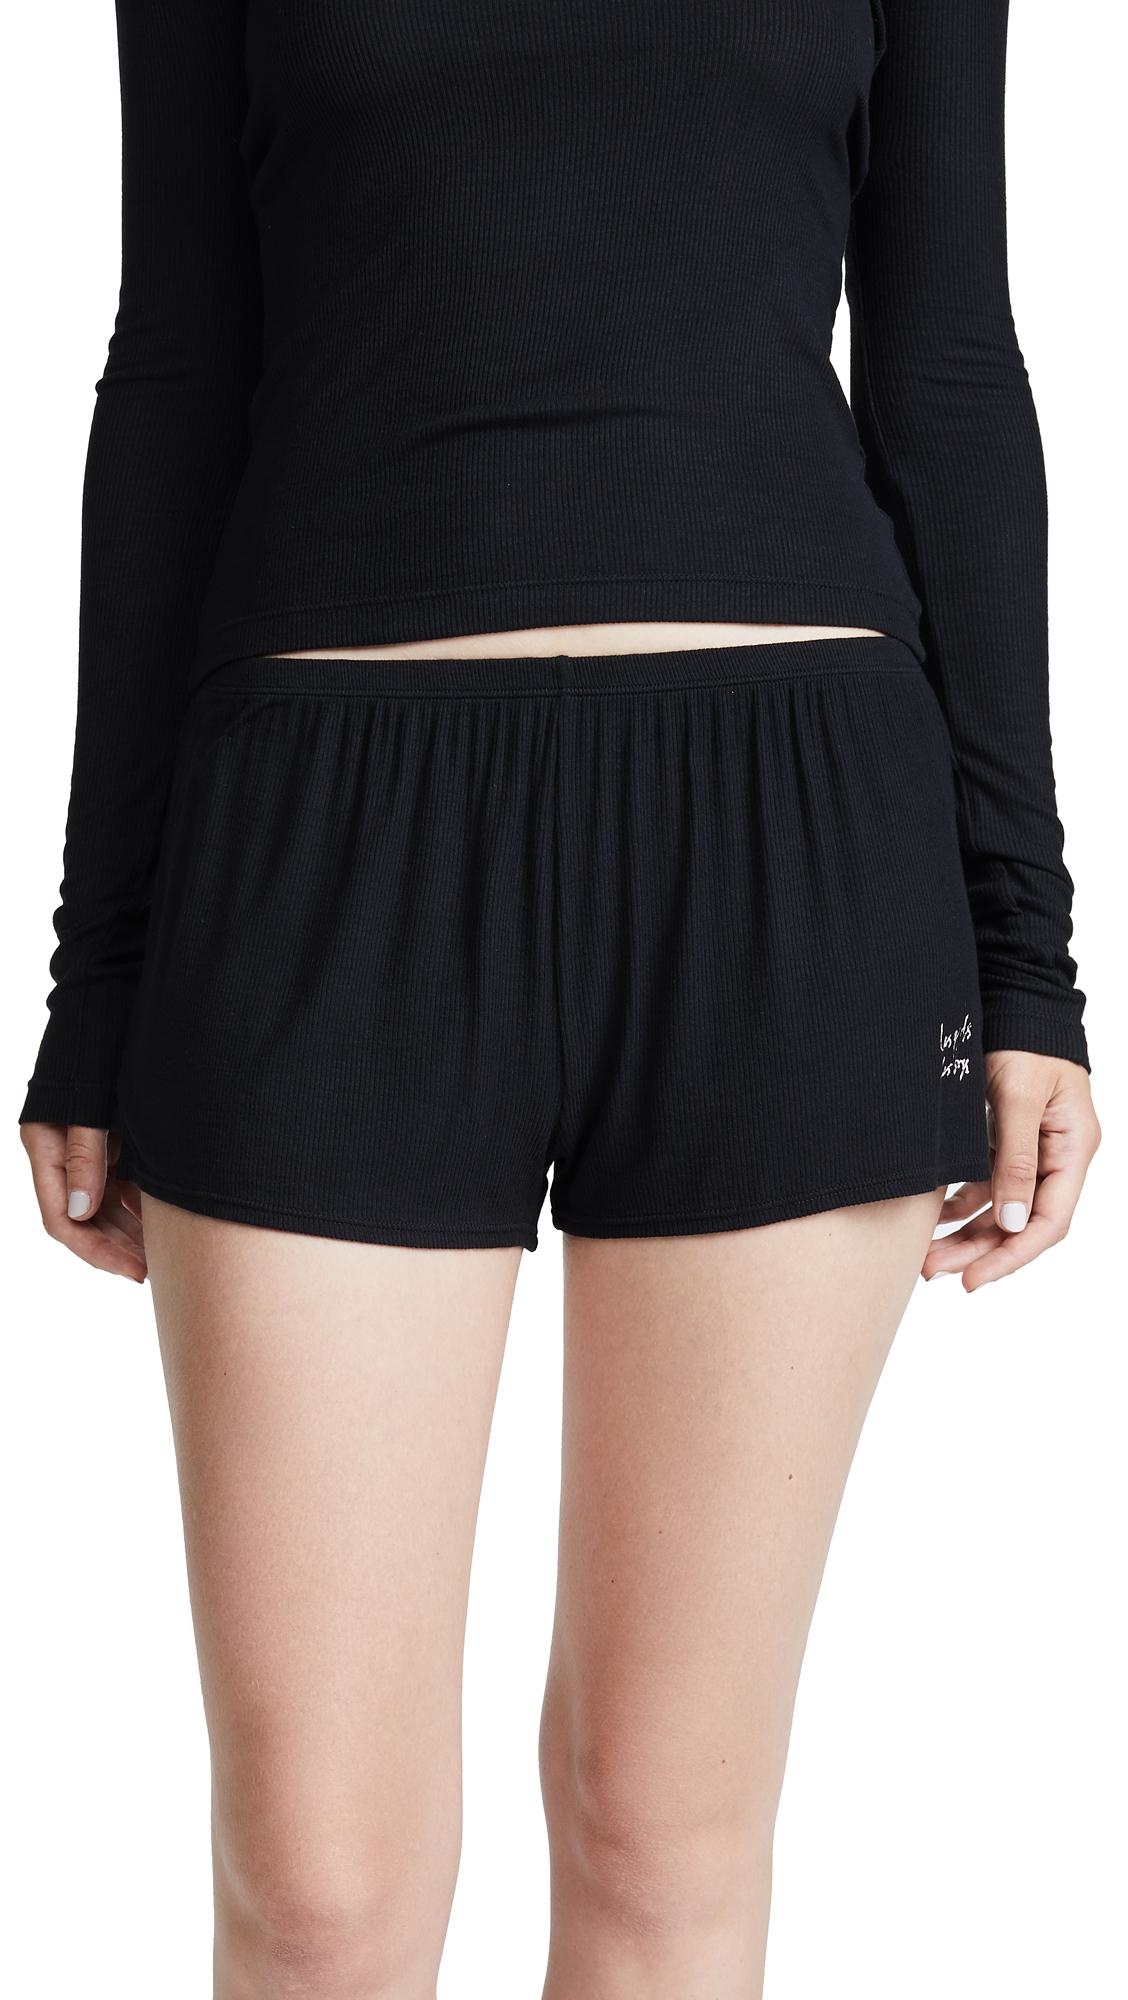 LES GIRLS LES BOYS Fine Rib Shorts in Black